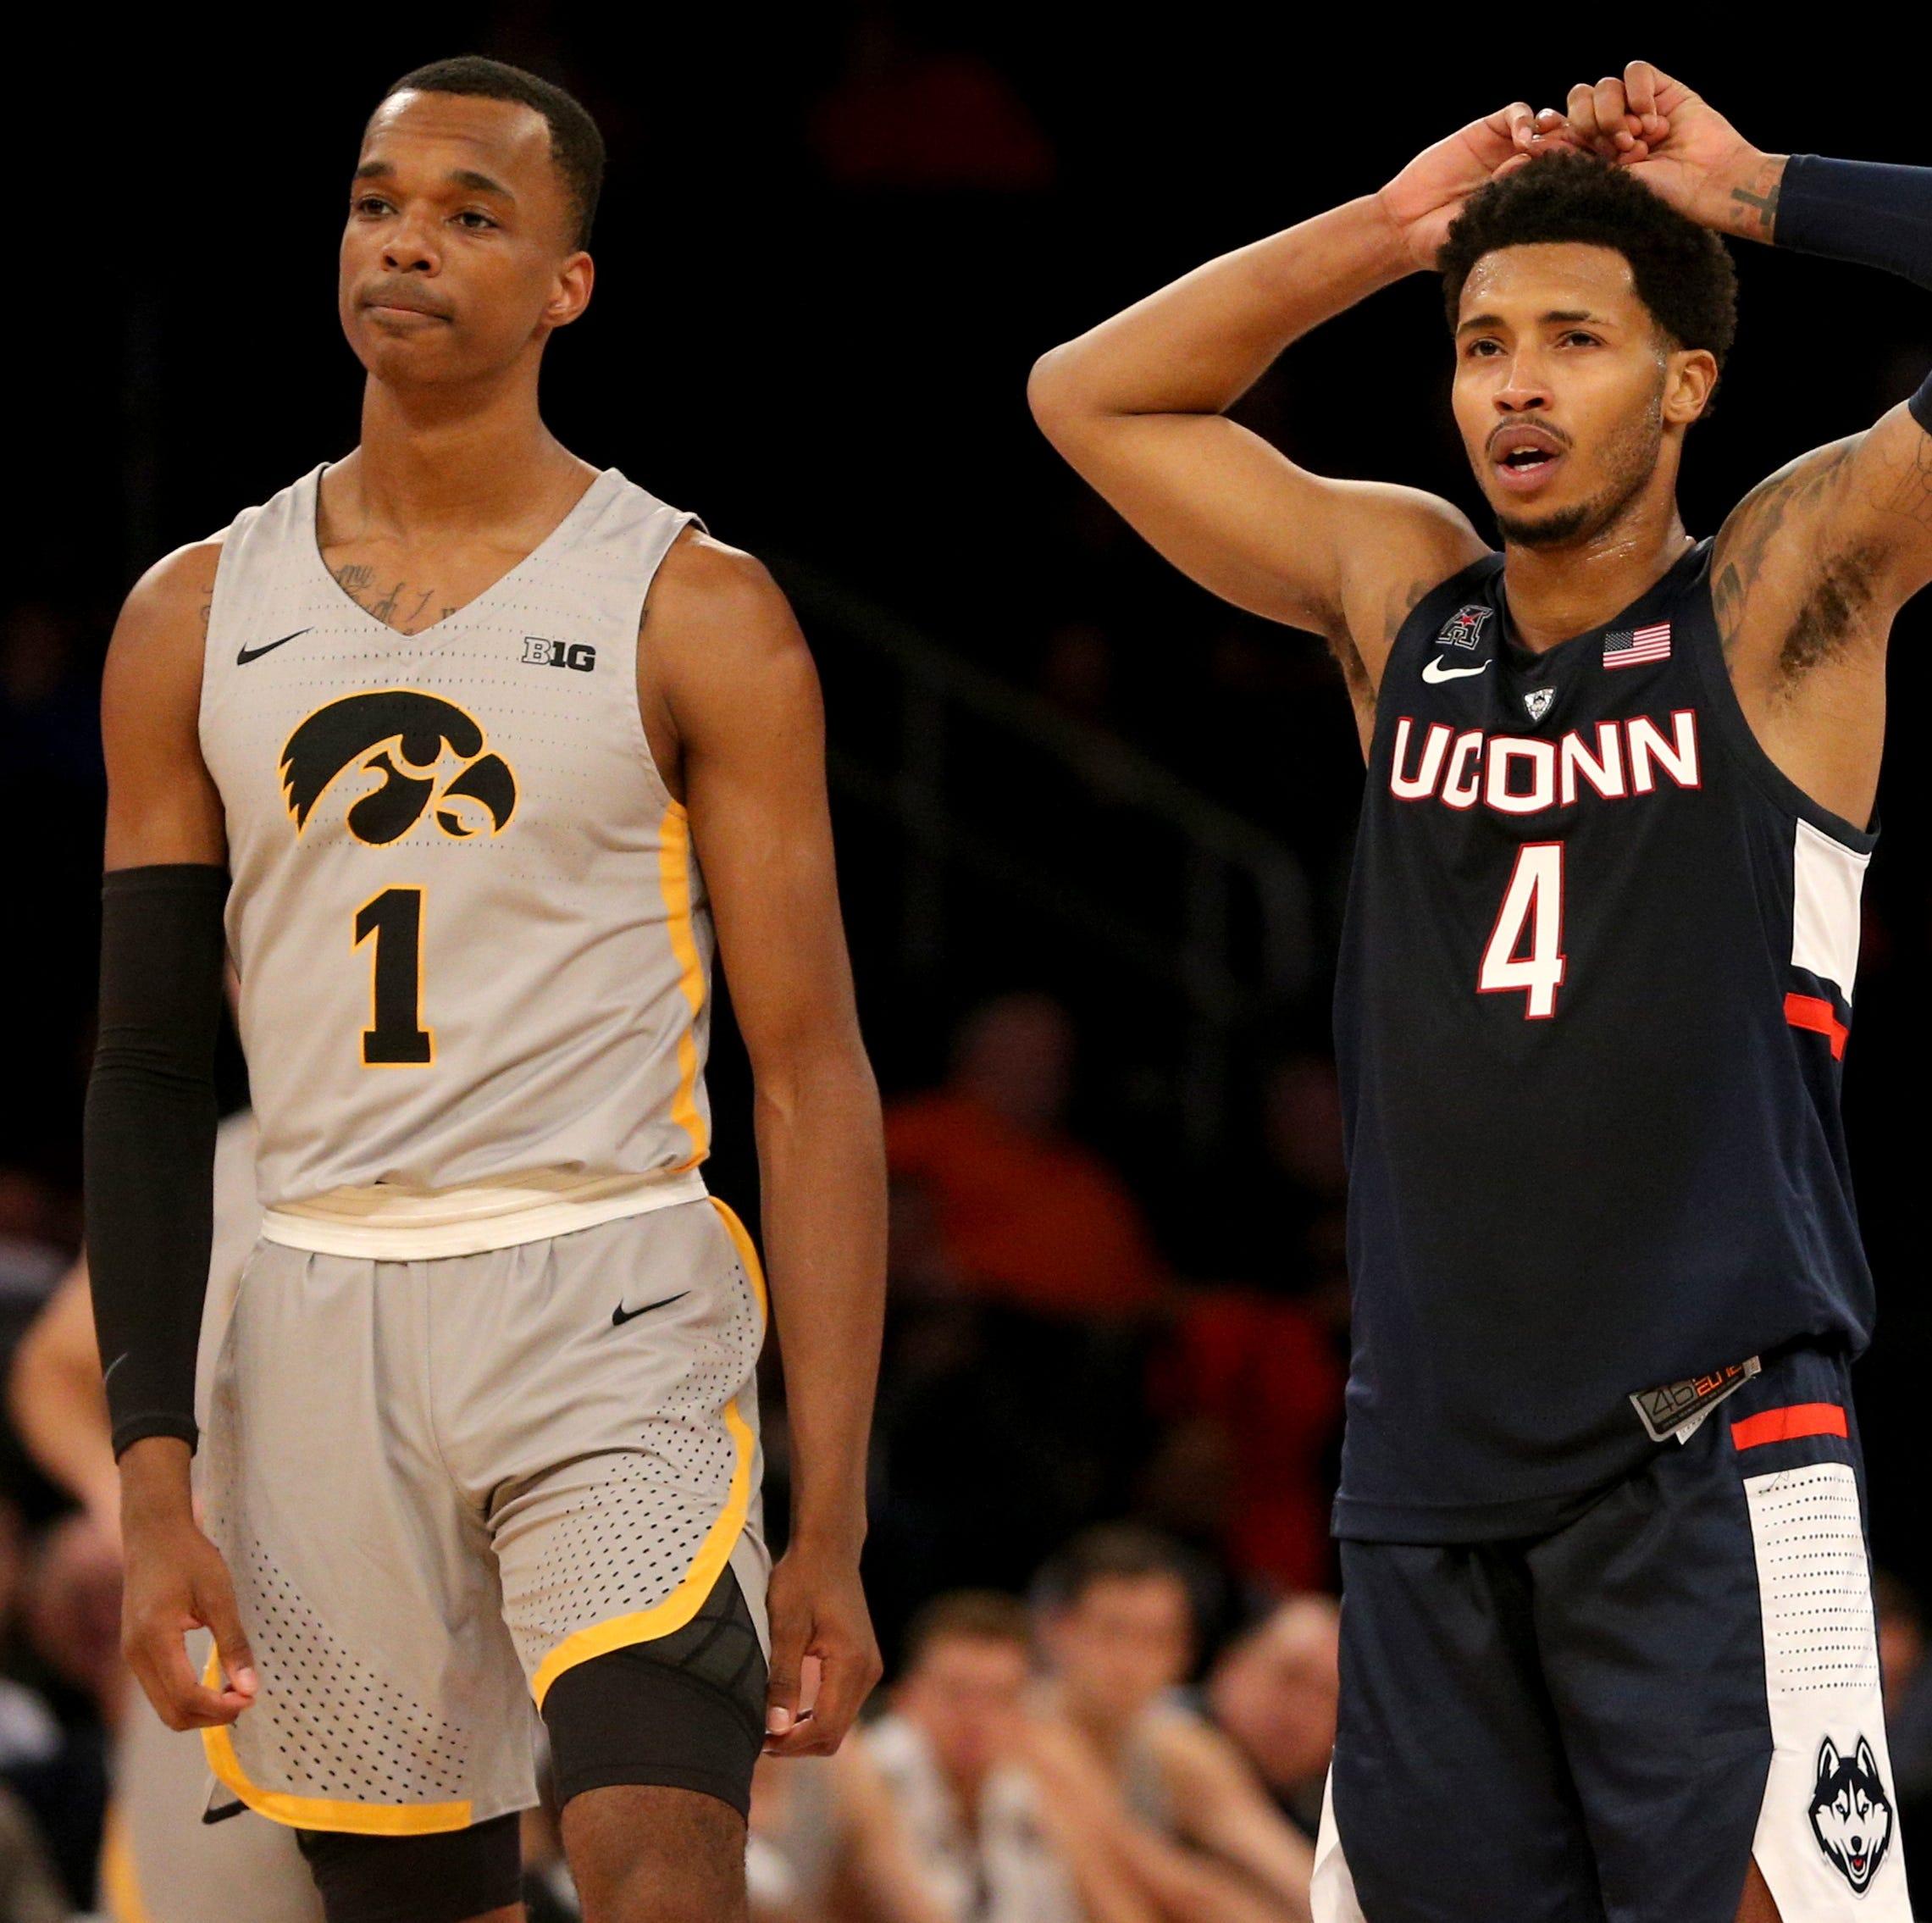 Iowa basketball takeaways: Versatility key to defensive improvement; turnovers a problem